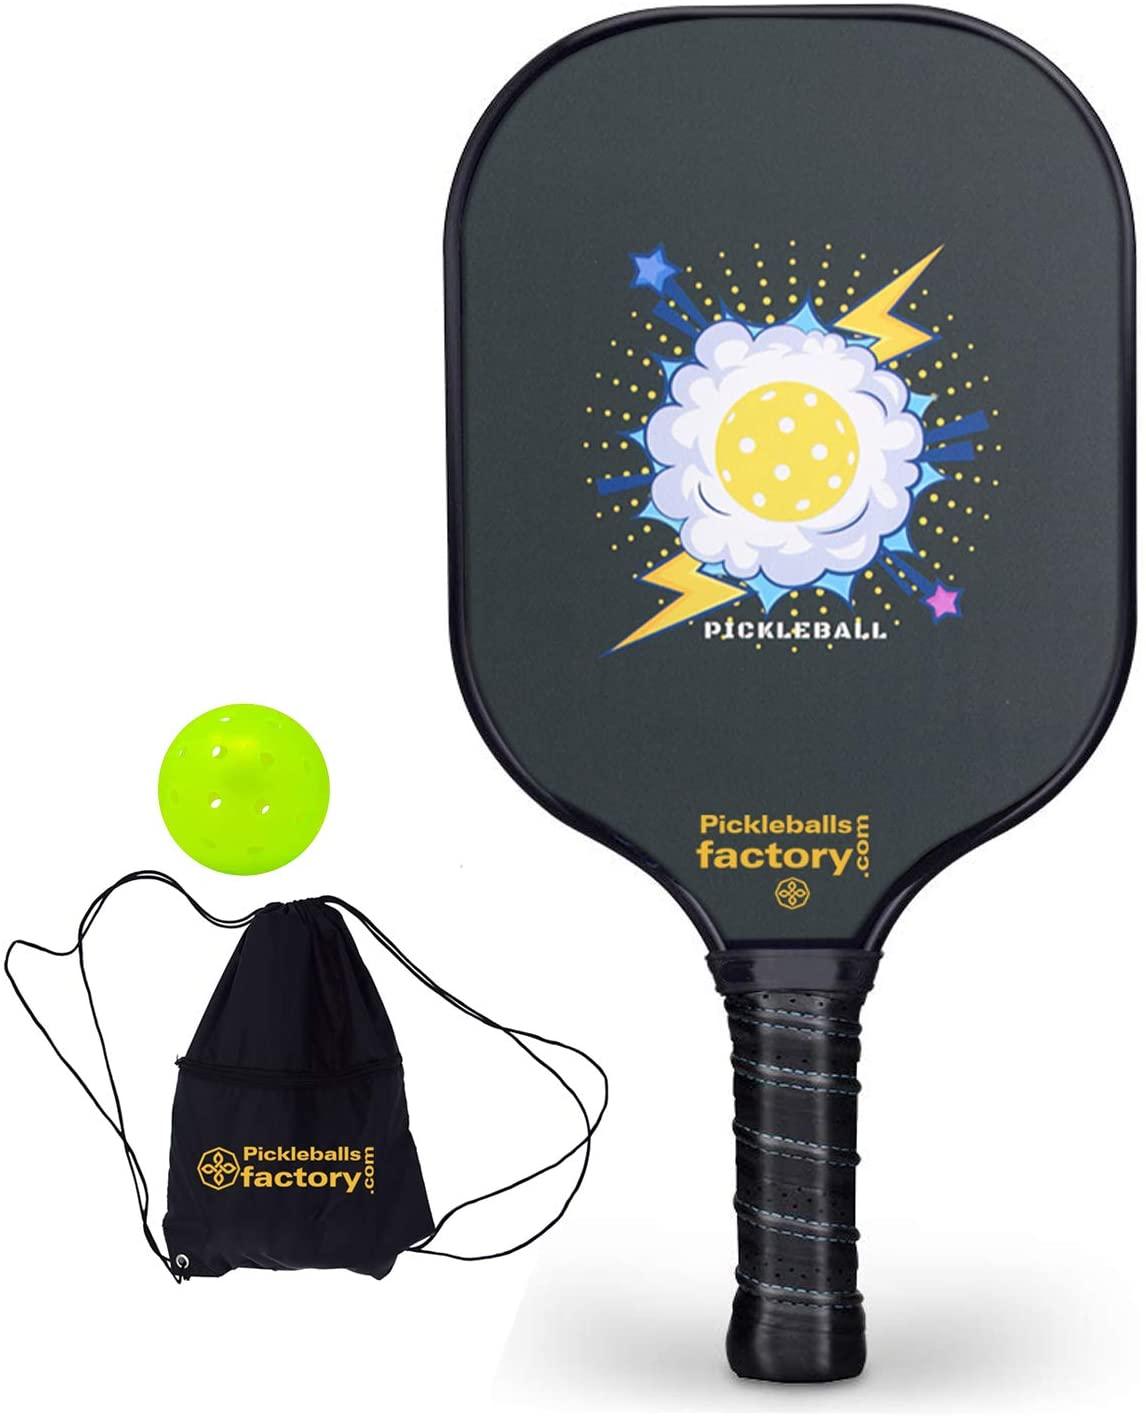 Pickleball Paddle, Pickleball Paddles, Pickleballs, Pickleball Paddles Graphite, Pickleball Rackets, Cloud, Pickleball Racket, Usapa Approved Pickleball Paddles and Balls Pickle Ball Net Bag